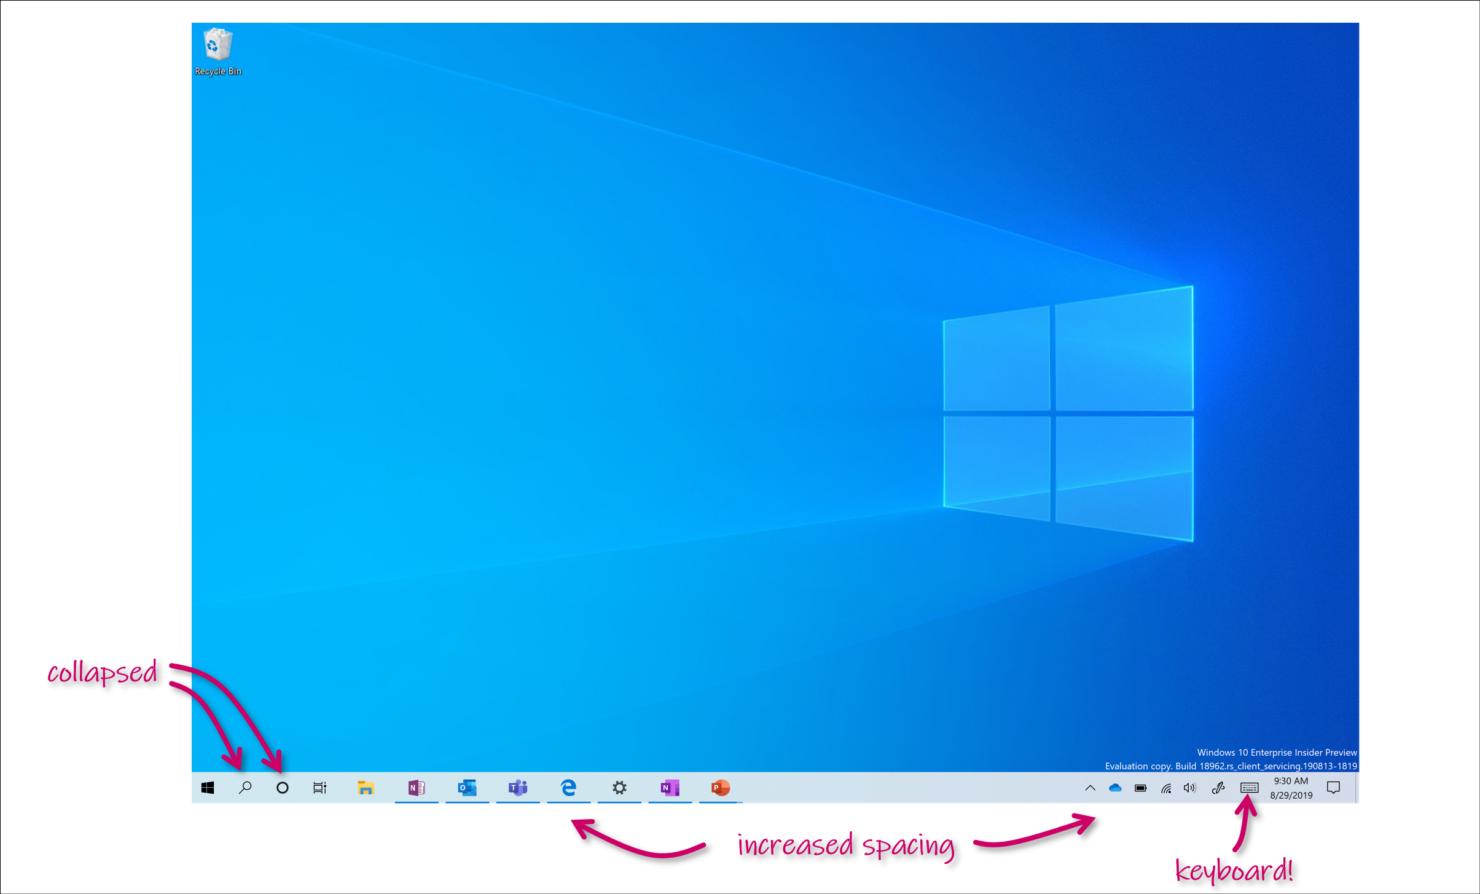 windows 10 2020 windows 10 tablet experience